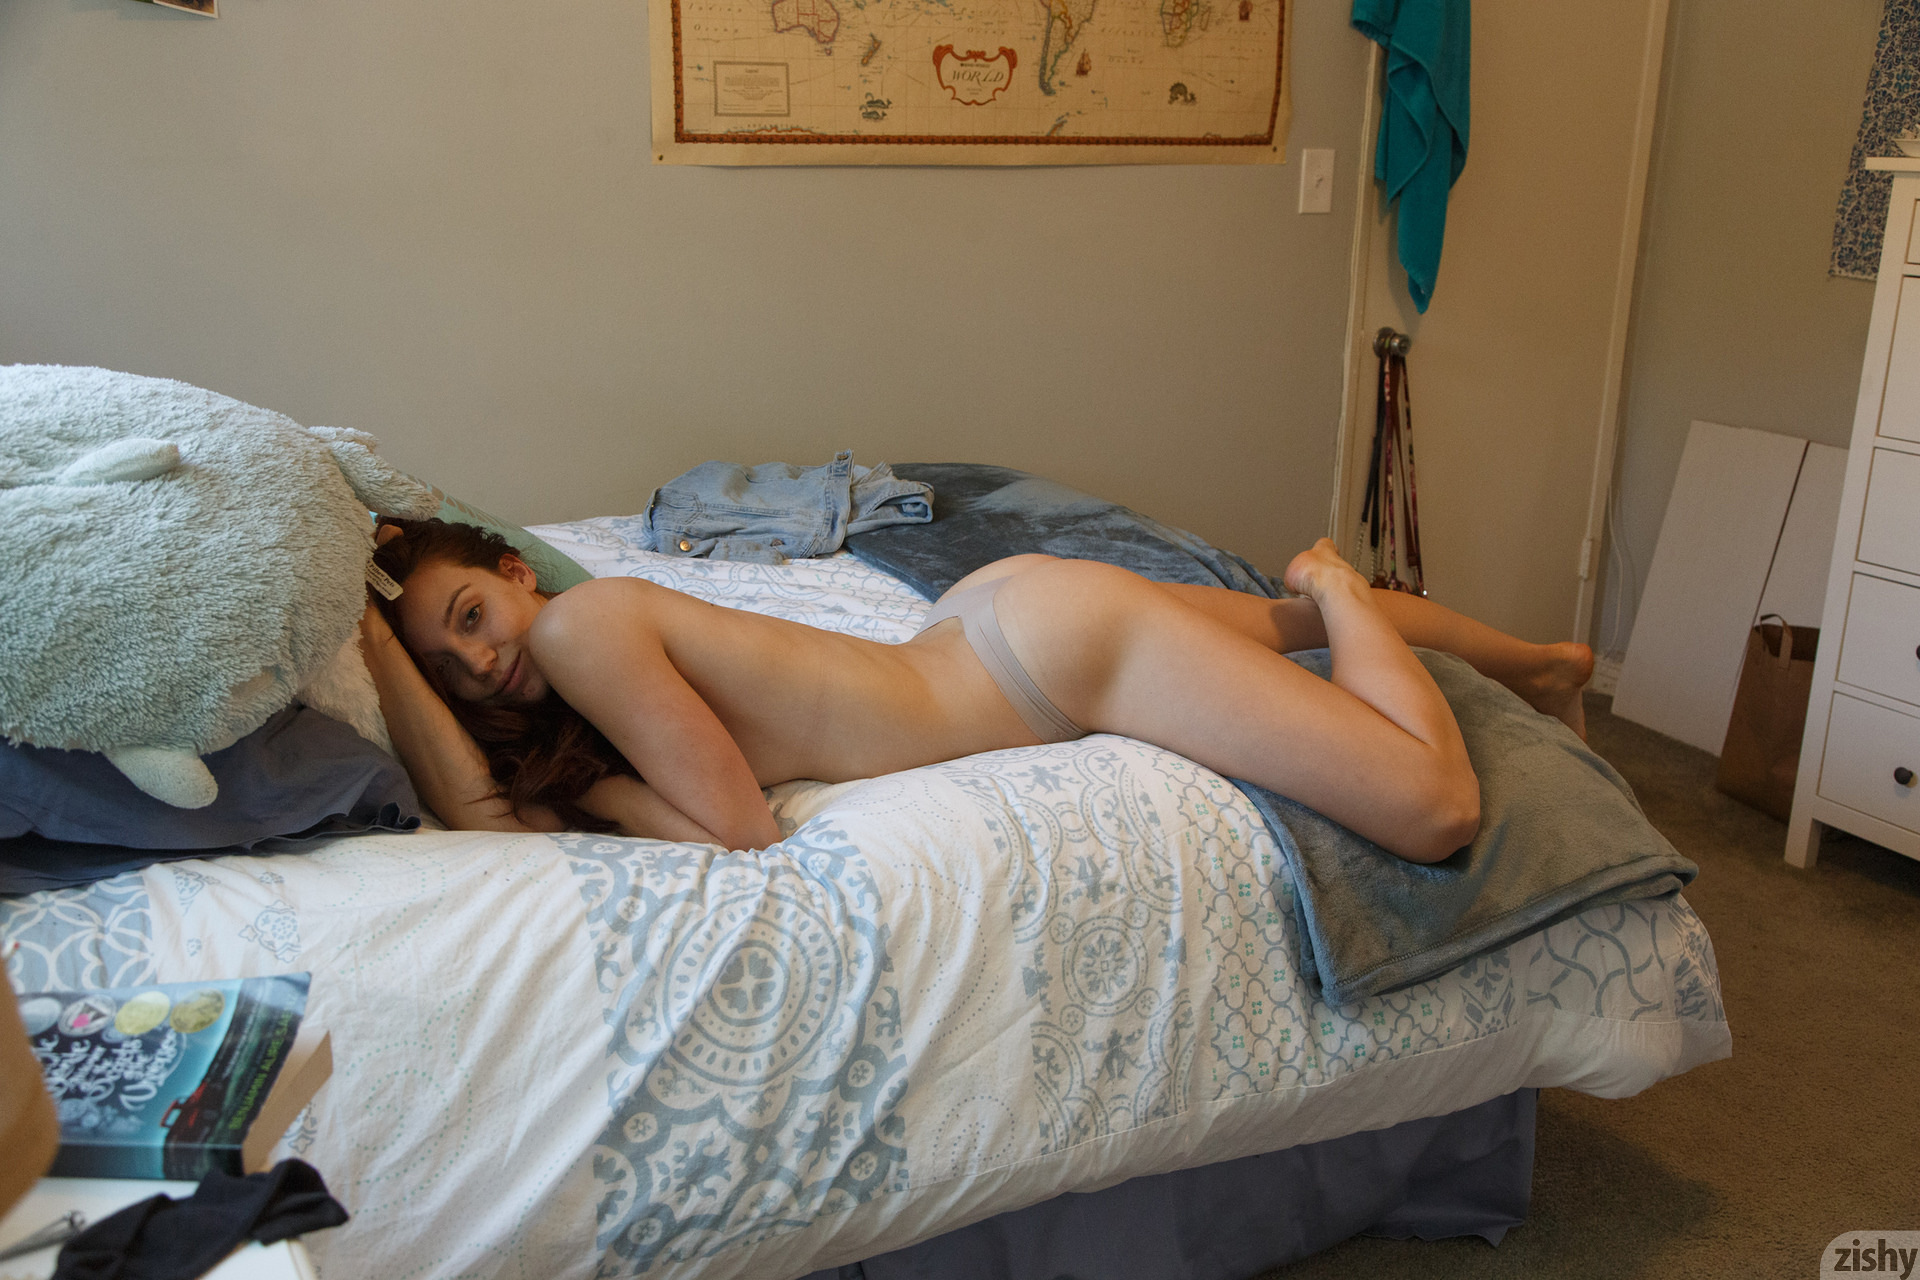 Ivah Anseline Hard But Soft Zishy (33)